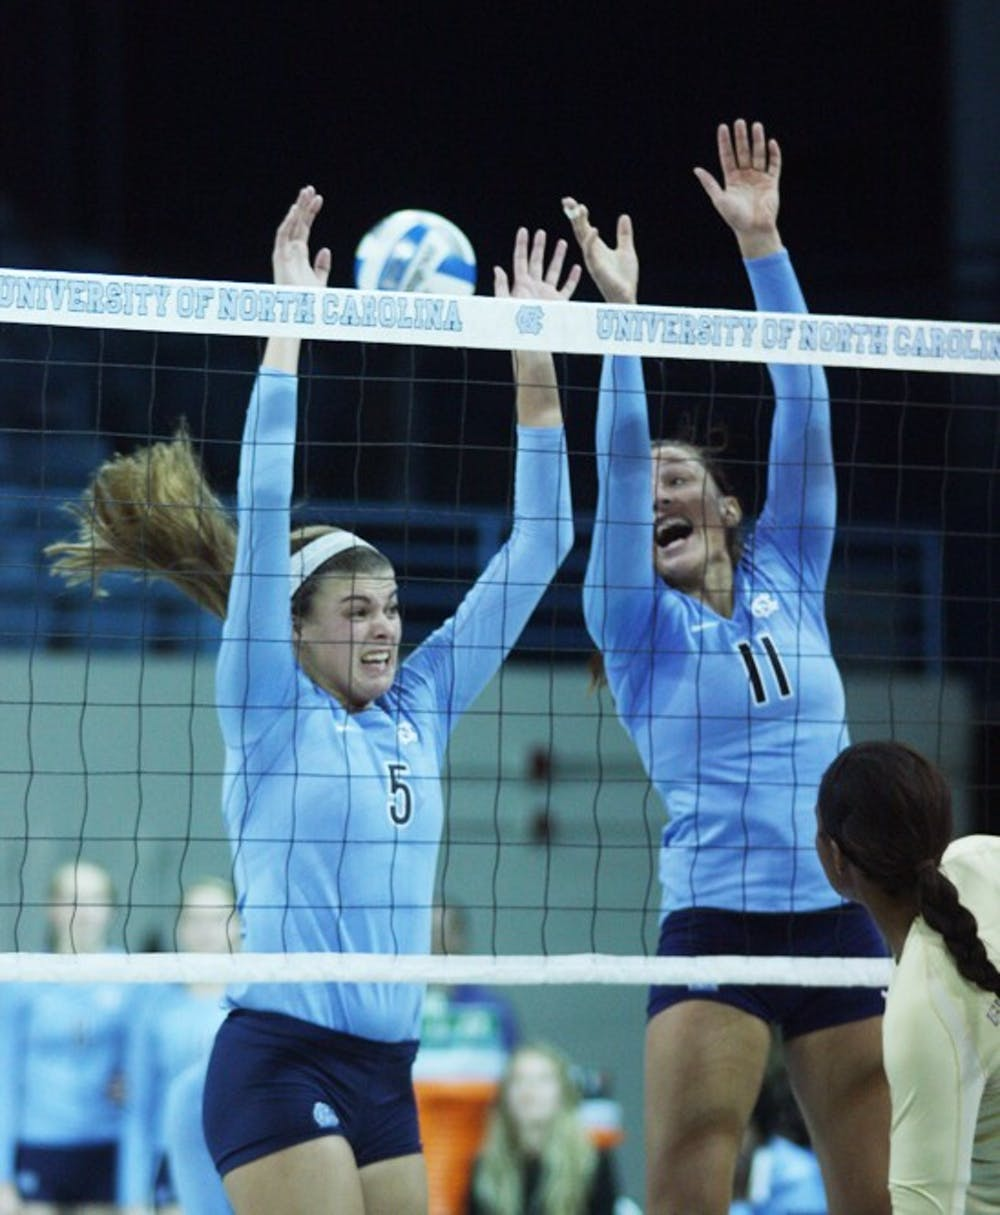 Volleyball Saturday 5pm v. Florida StateWe won! Yay! (lost 1st set, won the next 3 sets)